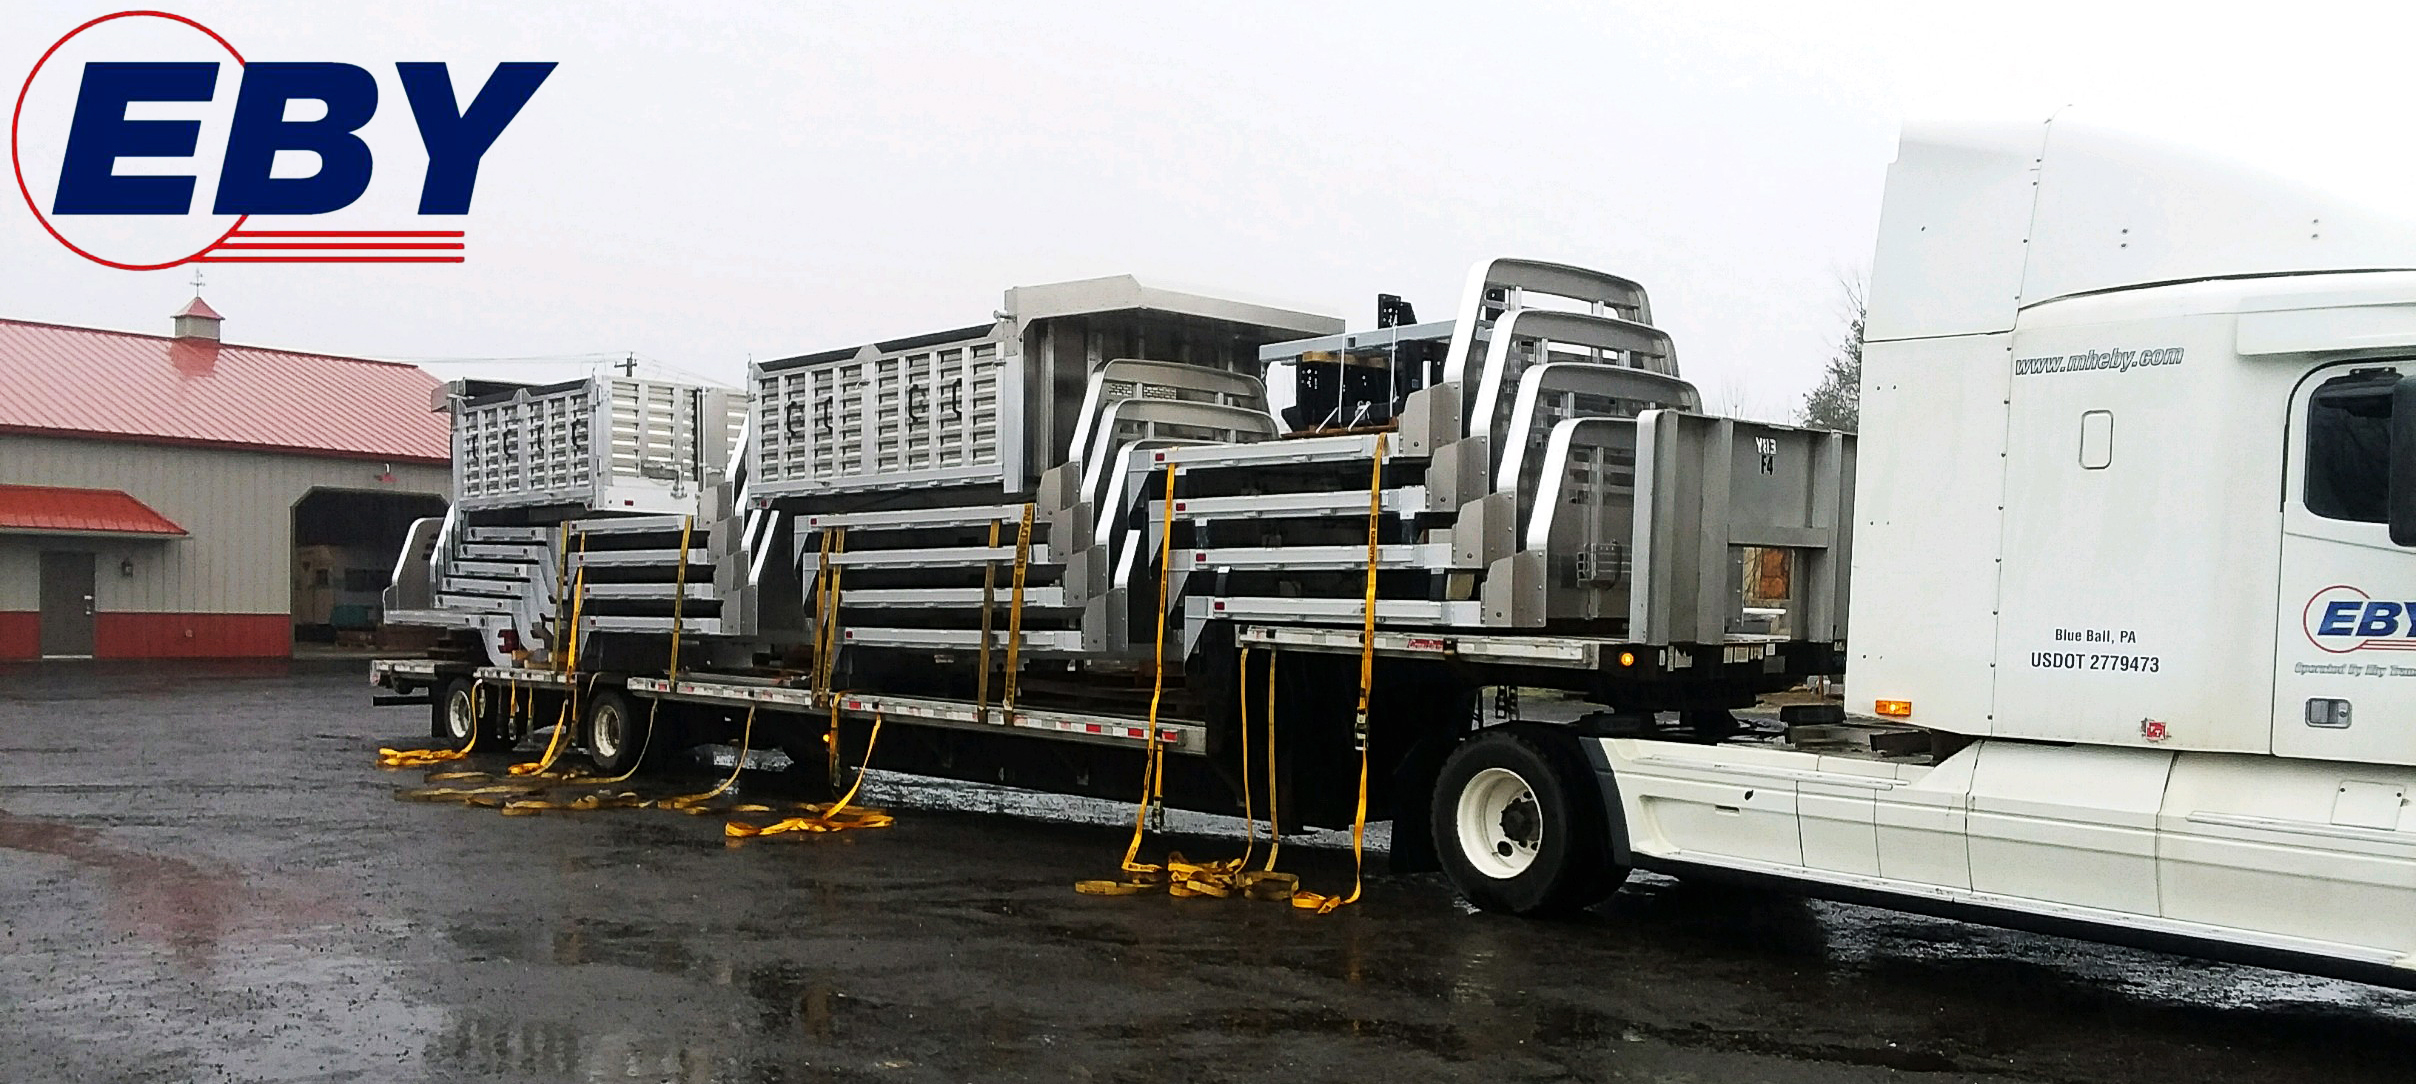 Netd Custom Aluminum Fabrication Custom Truck Bodies Dump Bodies Fenders Toolboxes Boss Snowplows Lighting And More